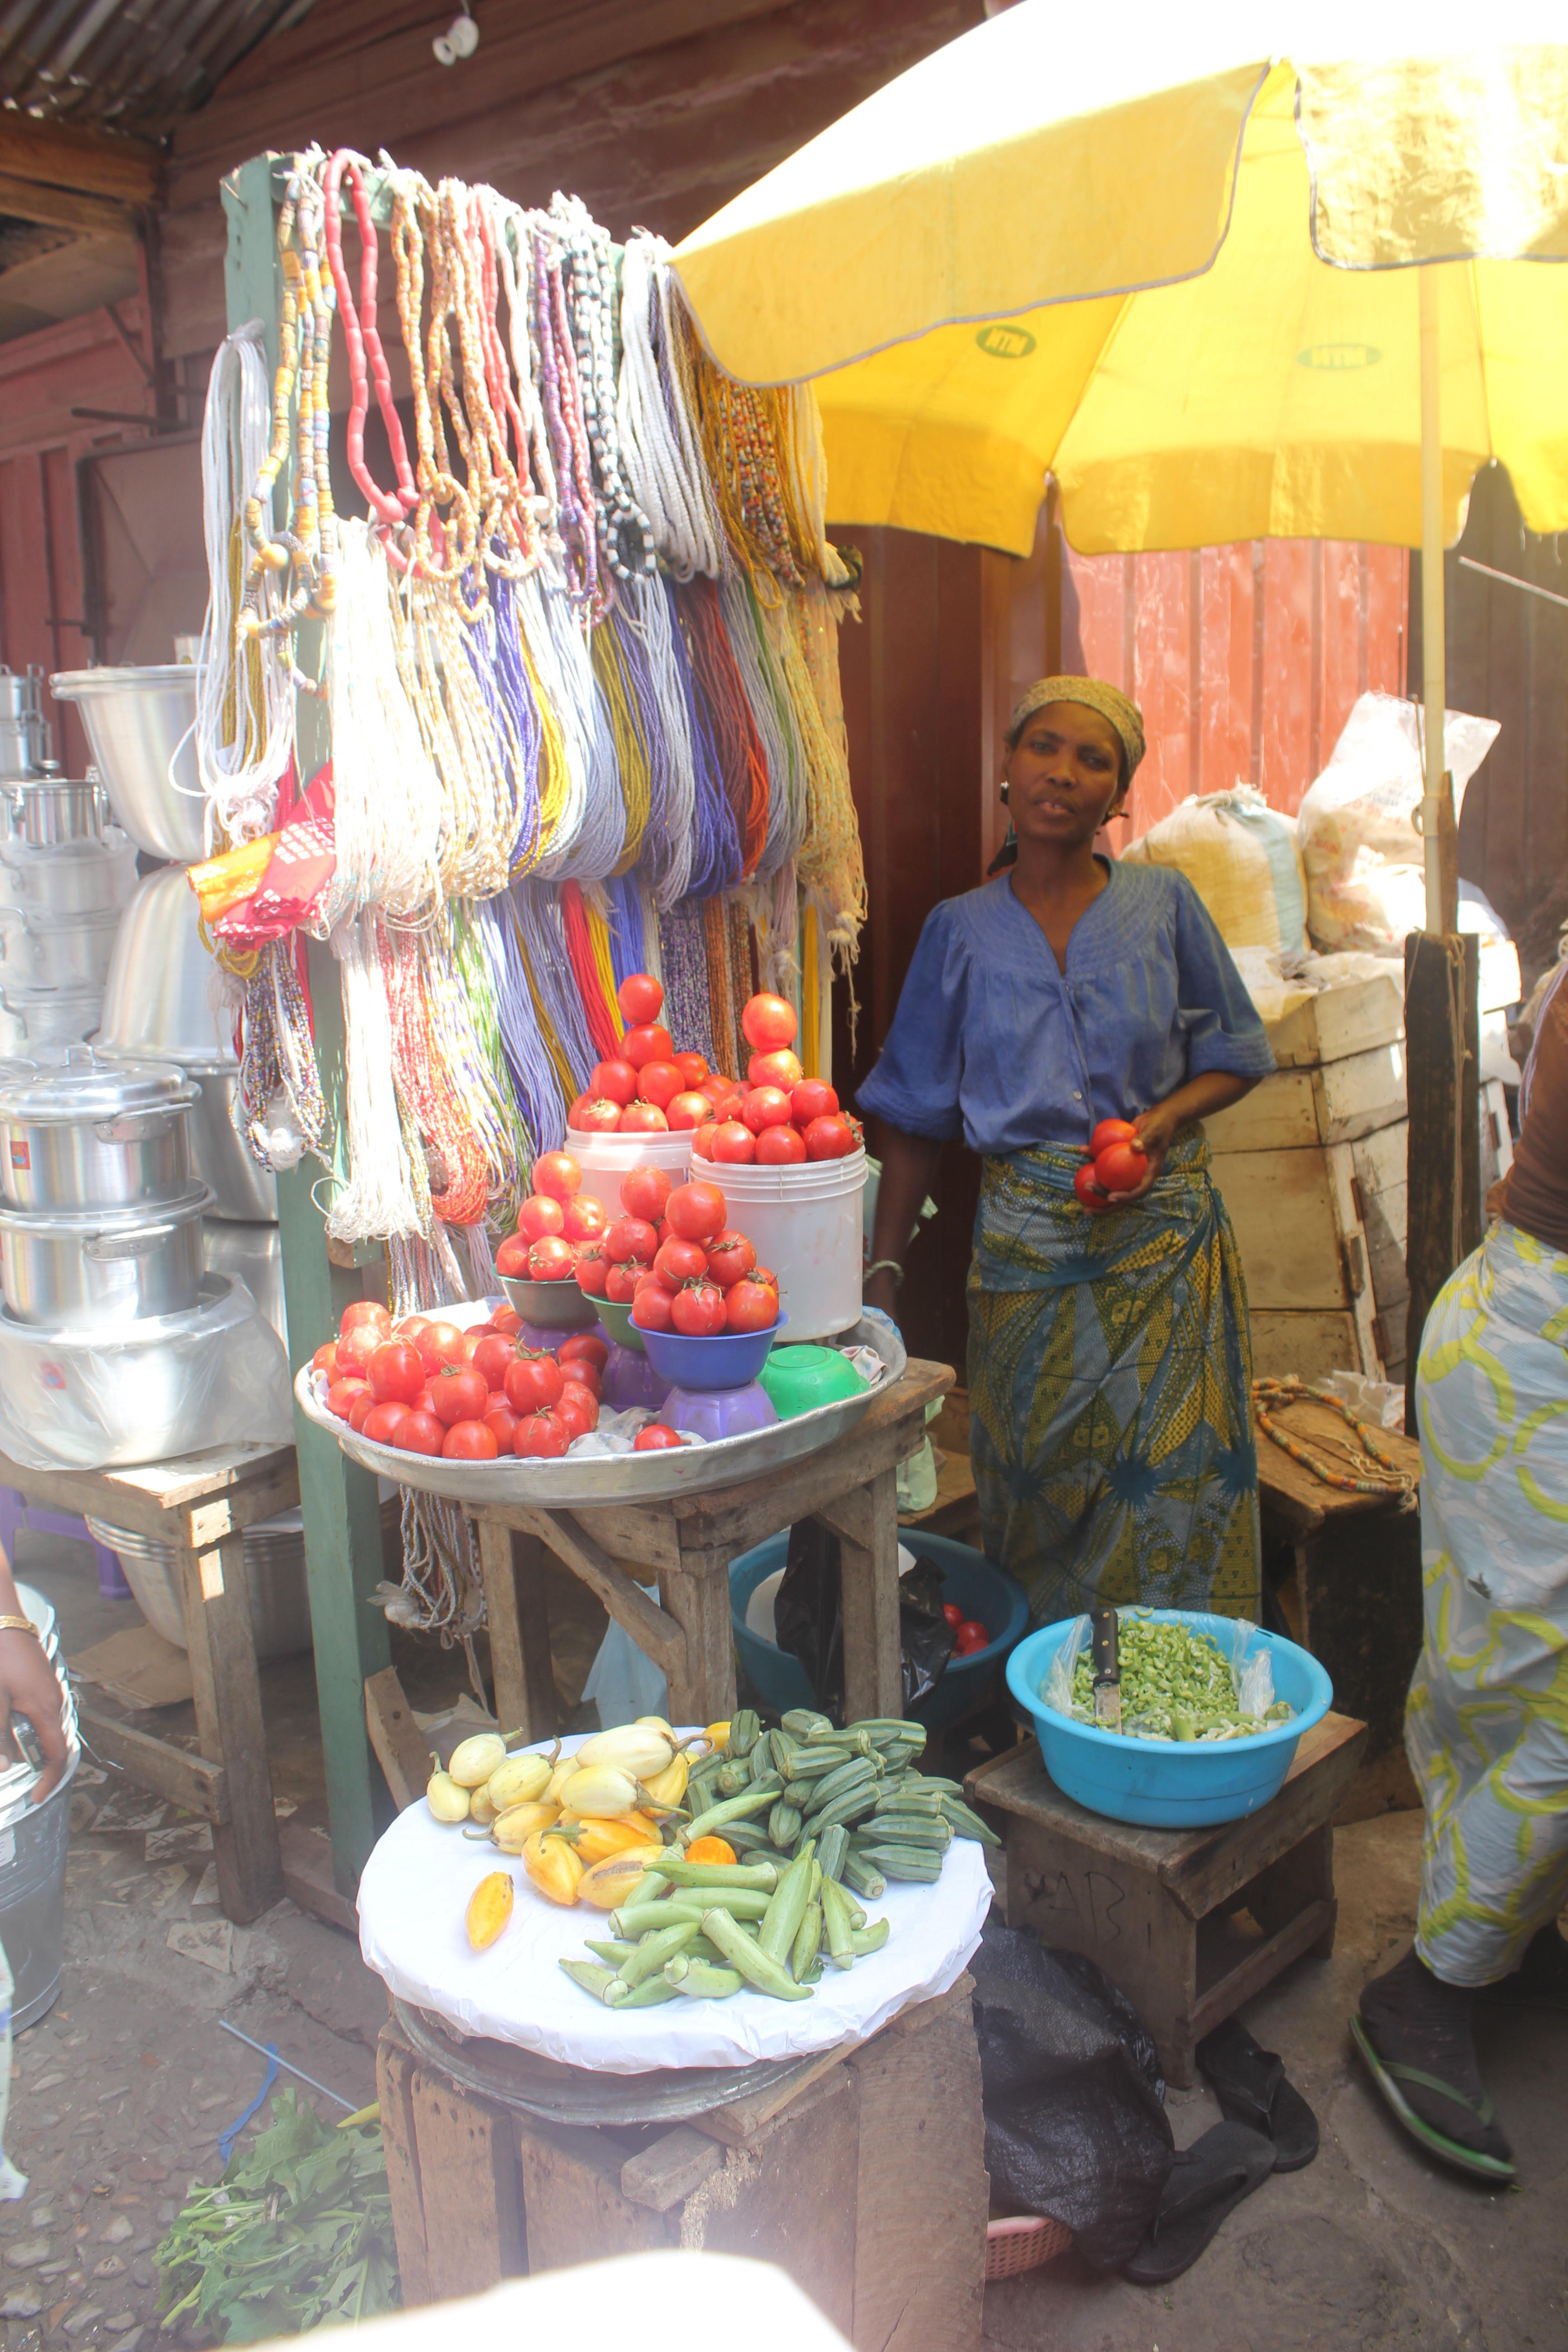 File:Jewelry and Fruit, Makola Market, Accra, Ghana JPG